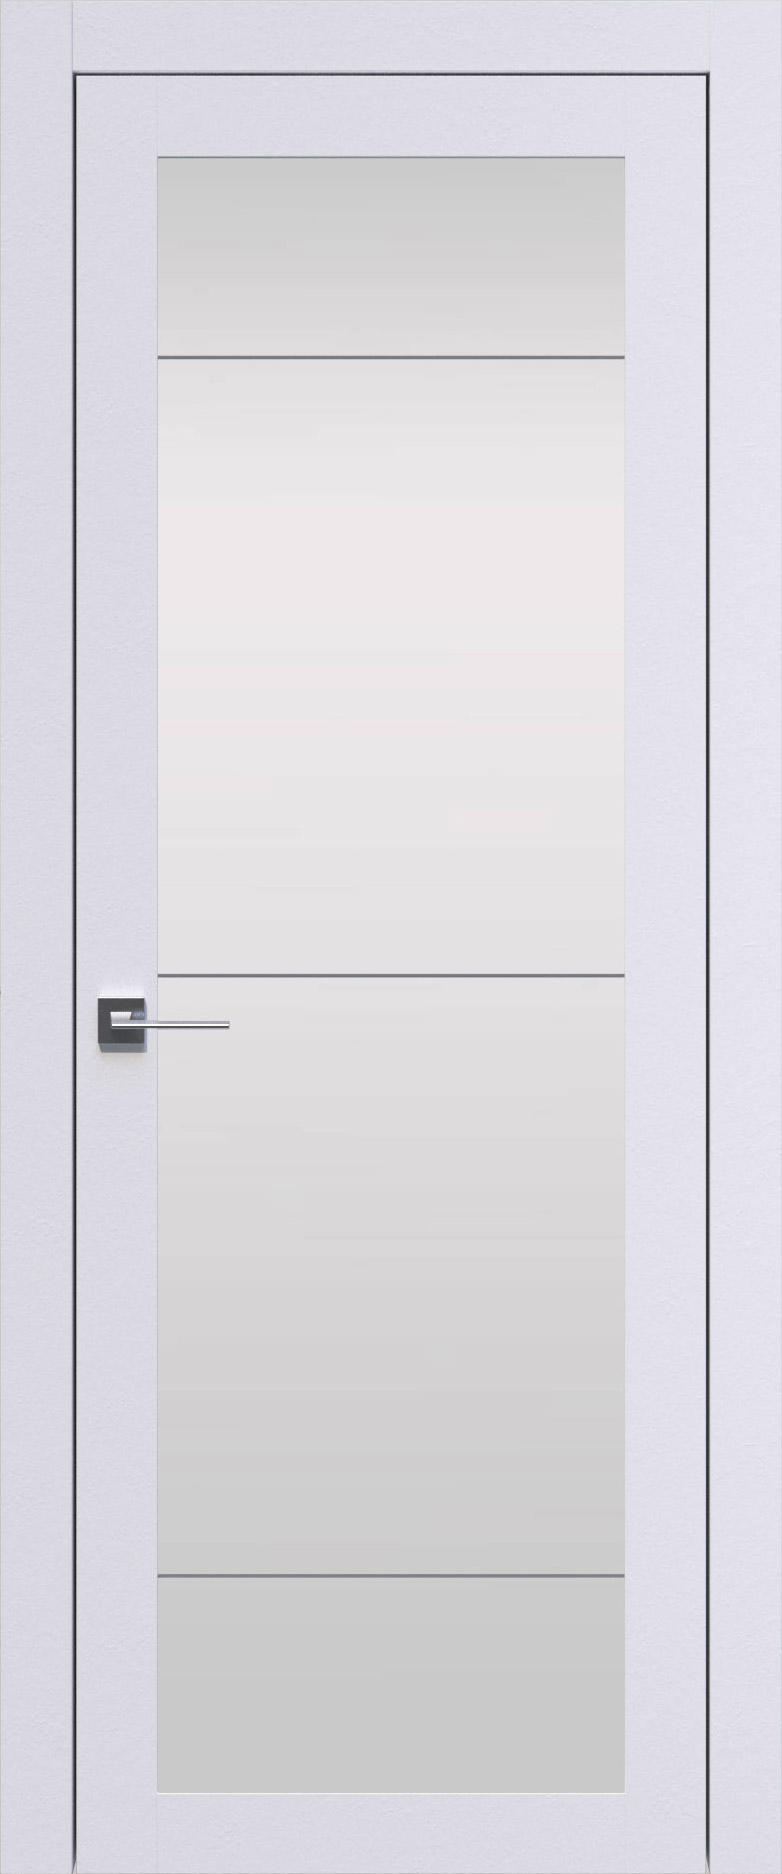 Tivoli З-3 цвет - Арктик белый Со стеклом (ДО)